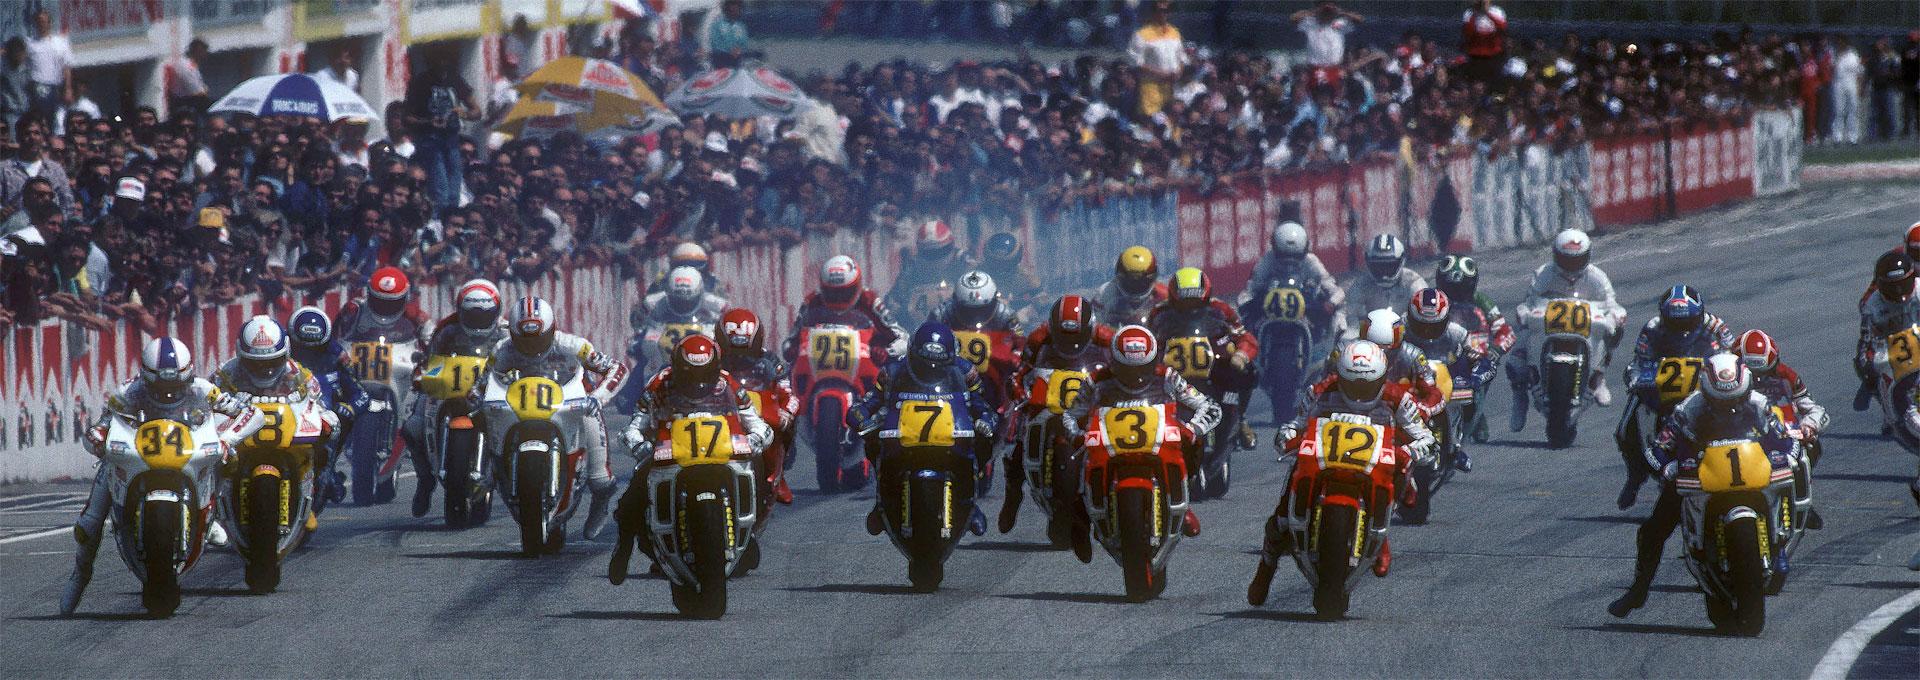 301840-Schwantz-34-Rainey-17-Sarron7-Lawson-3-De-Radigues-12-Gardner-1-Start-Italian-500GP-1988-1920x680